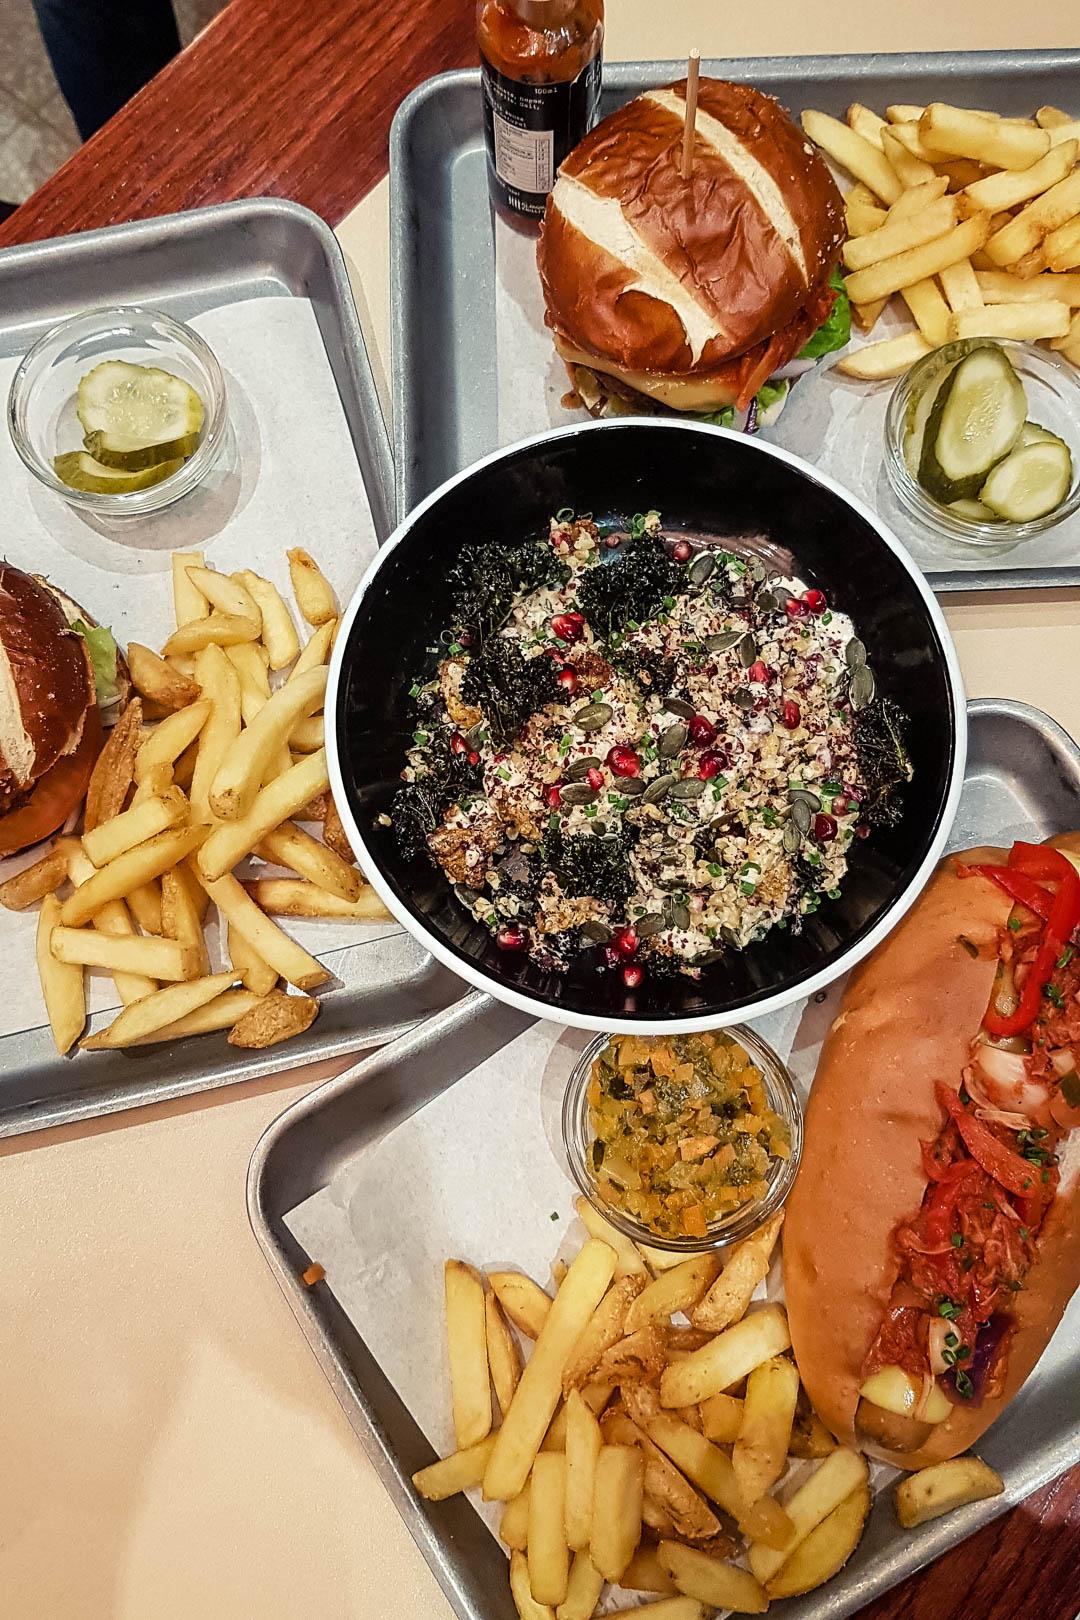 Vegan burgers, hotdogs and salad at Bath St Burger Glasgow